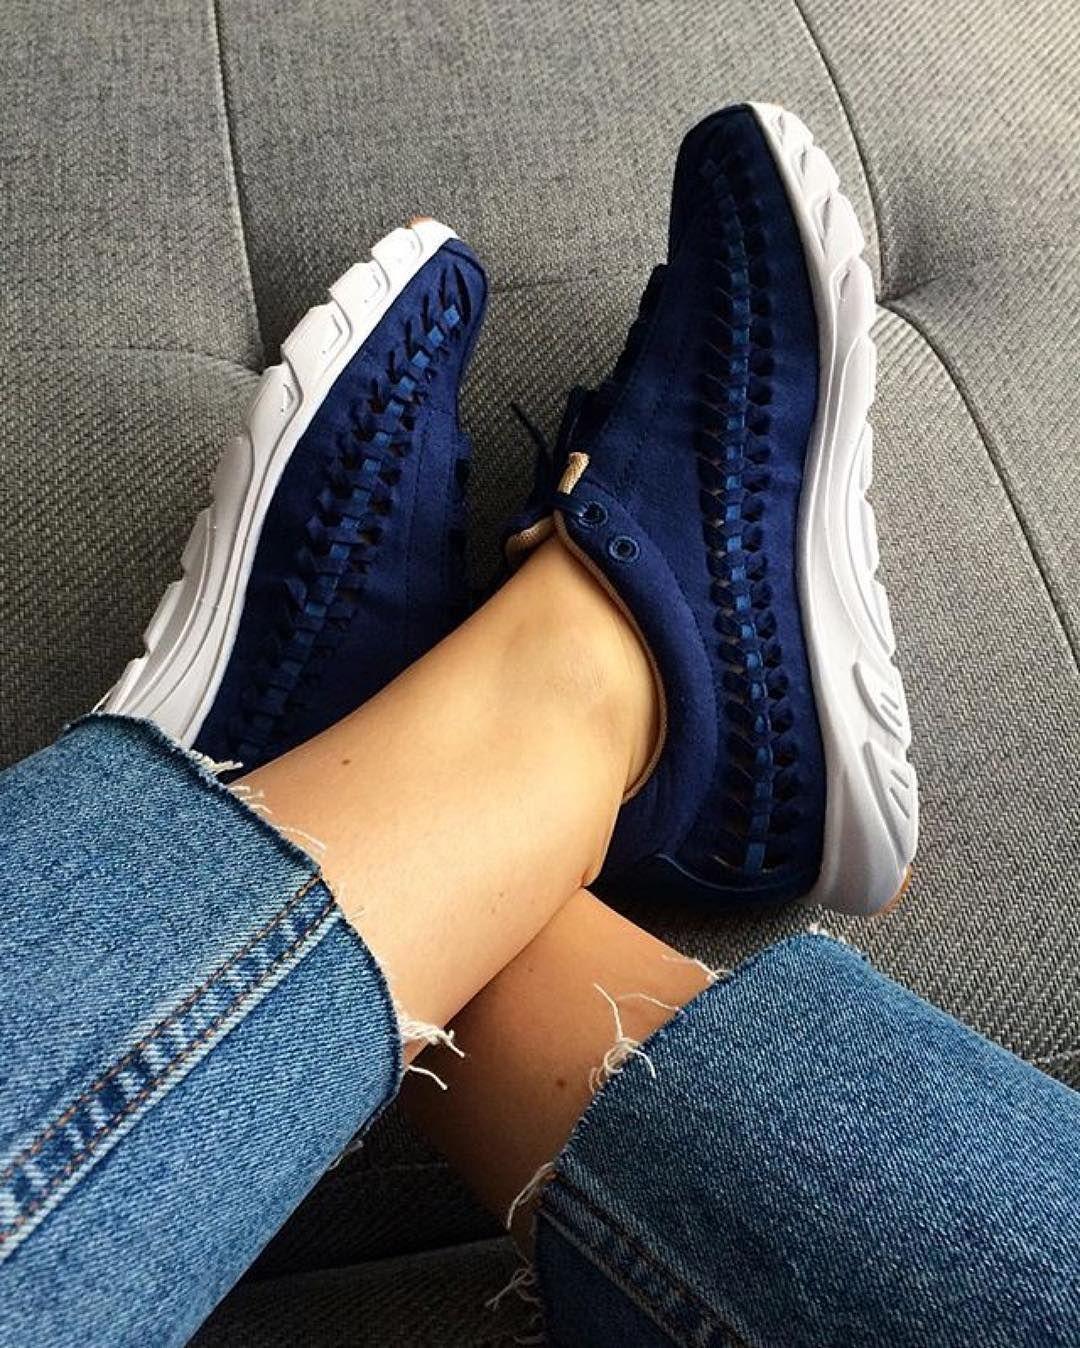 quality design 91268 ac13f Sneakers femme - Nike Mayfly Woven blue (©amyelisabethsegar)